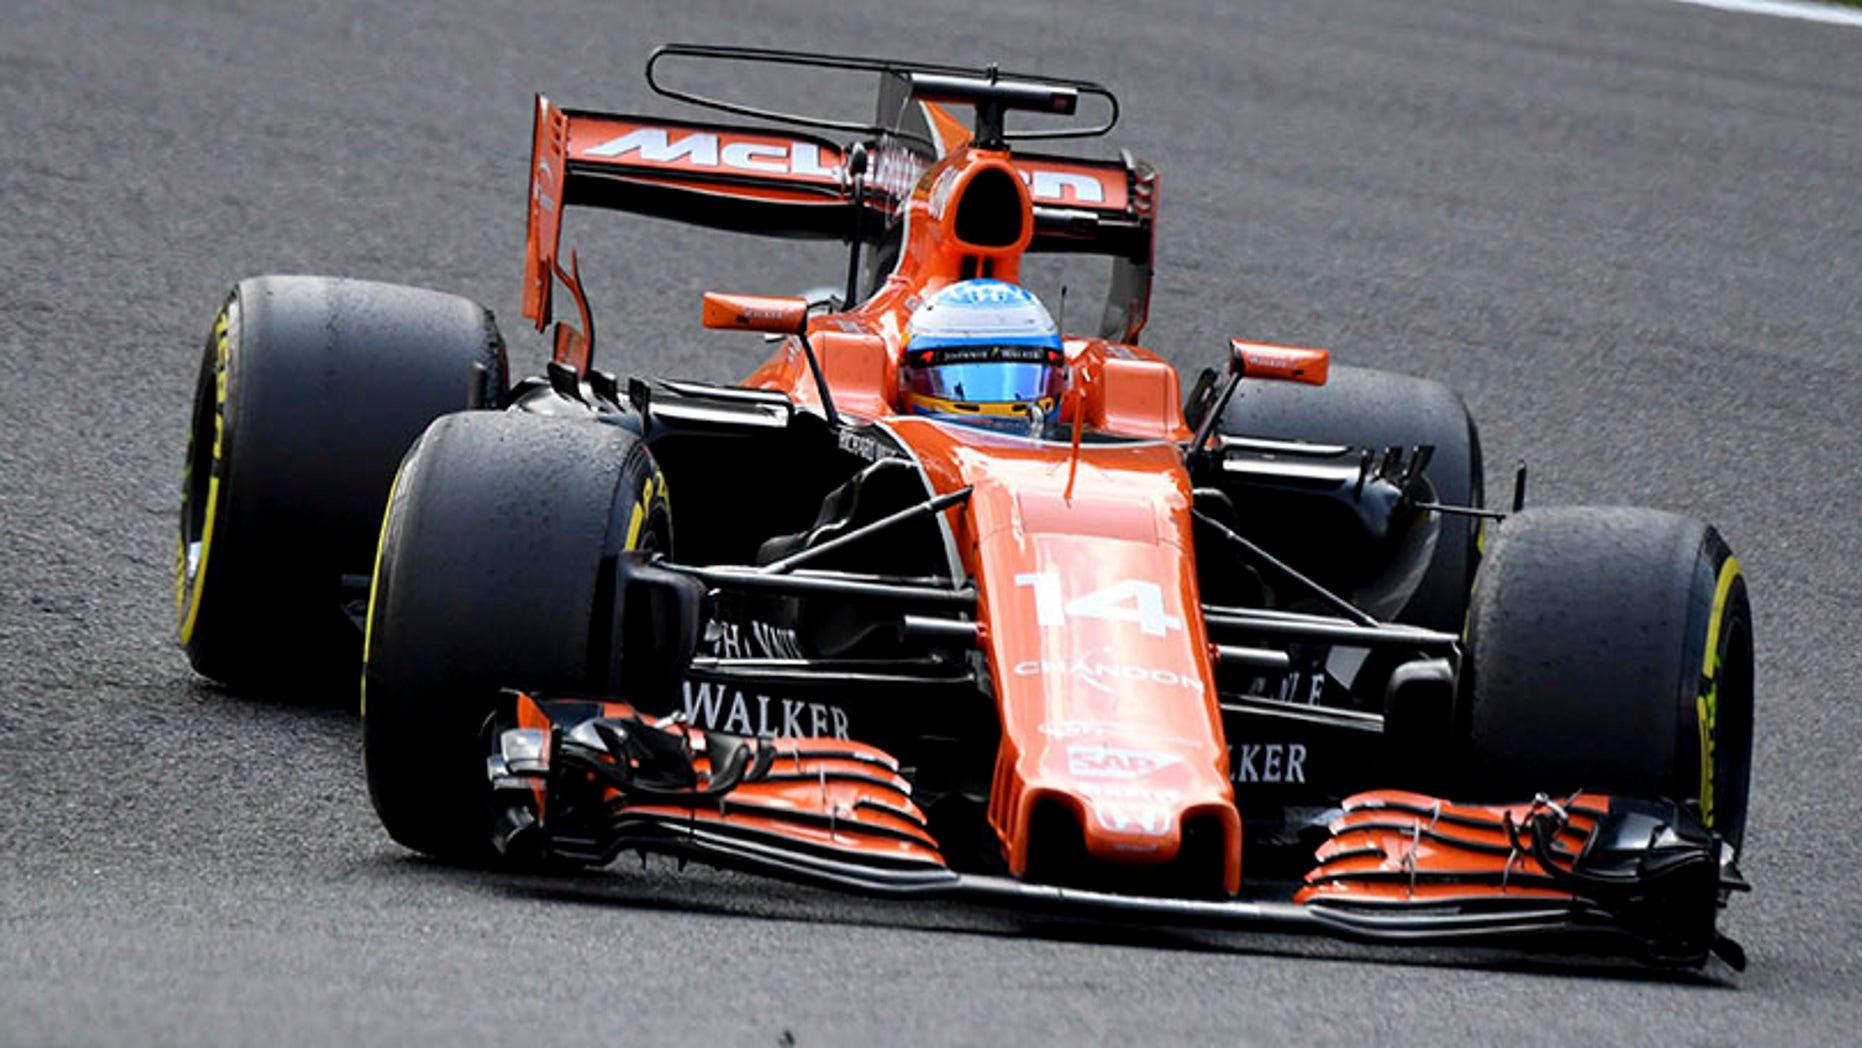 Mclaren driver Fernando Alonso of Spain steers his car during the Belgian Formula One Grand Prix in Spa-Francorchamps, Belgium, Sunday, Aug. 27, 2017. (AP Photo/Geert Vanden Wijngaert)